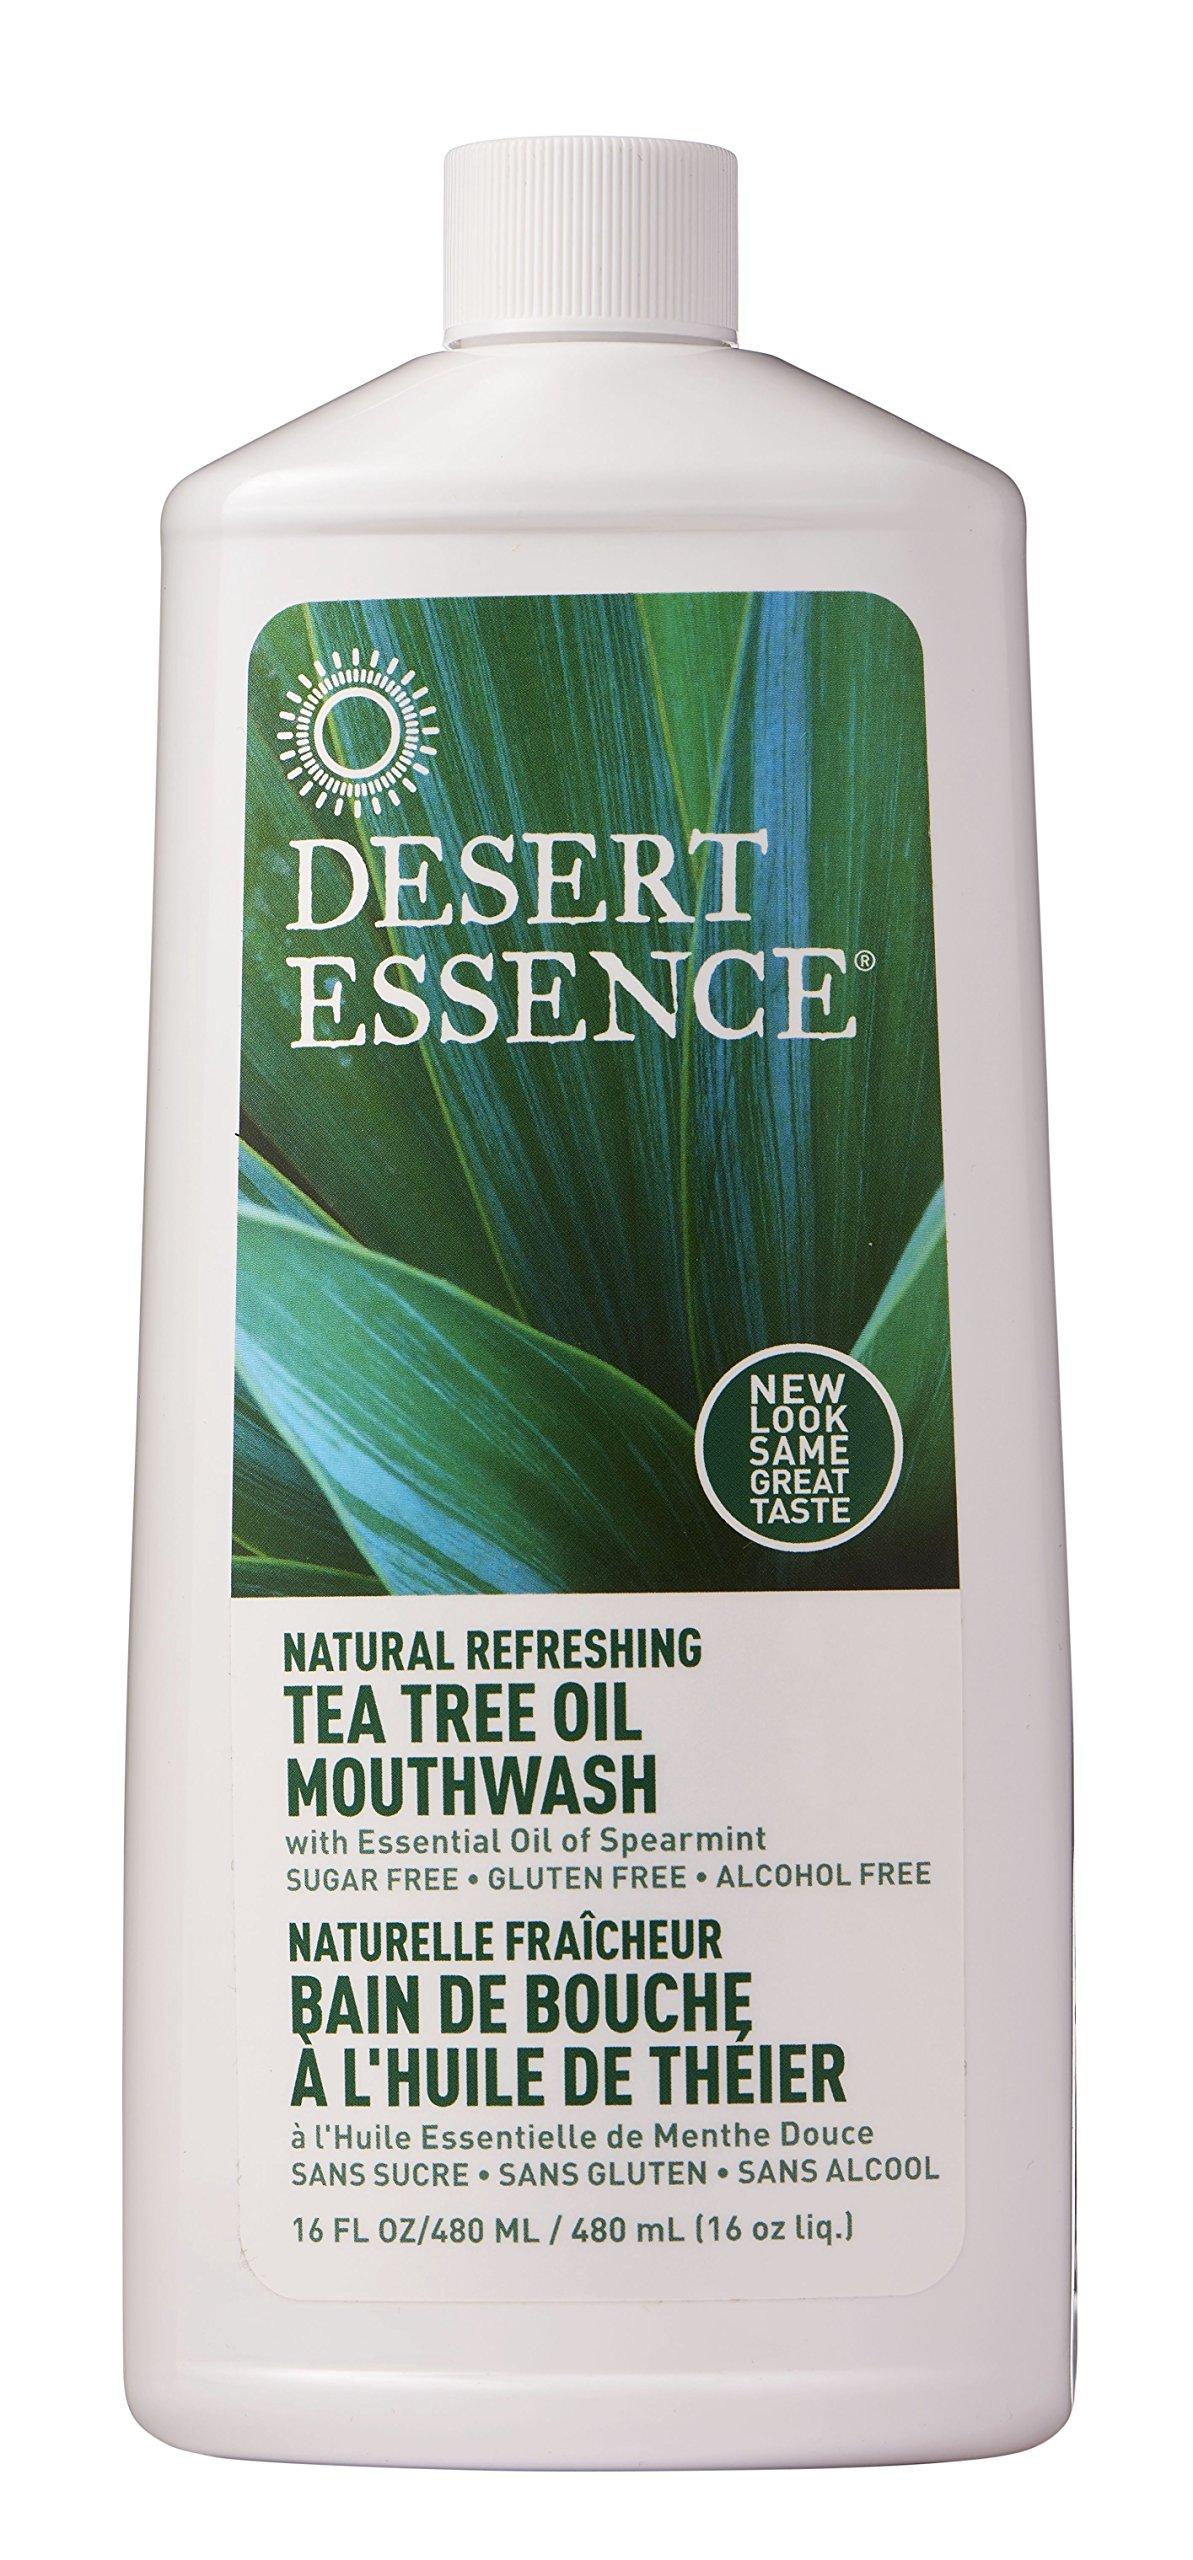 Natural Tea Tree Oil Mouthwash(2pk) - 16 fl oz